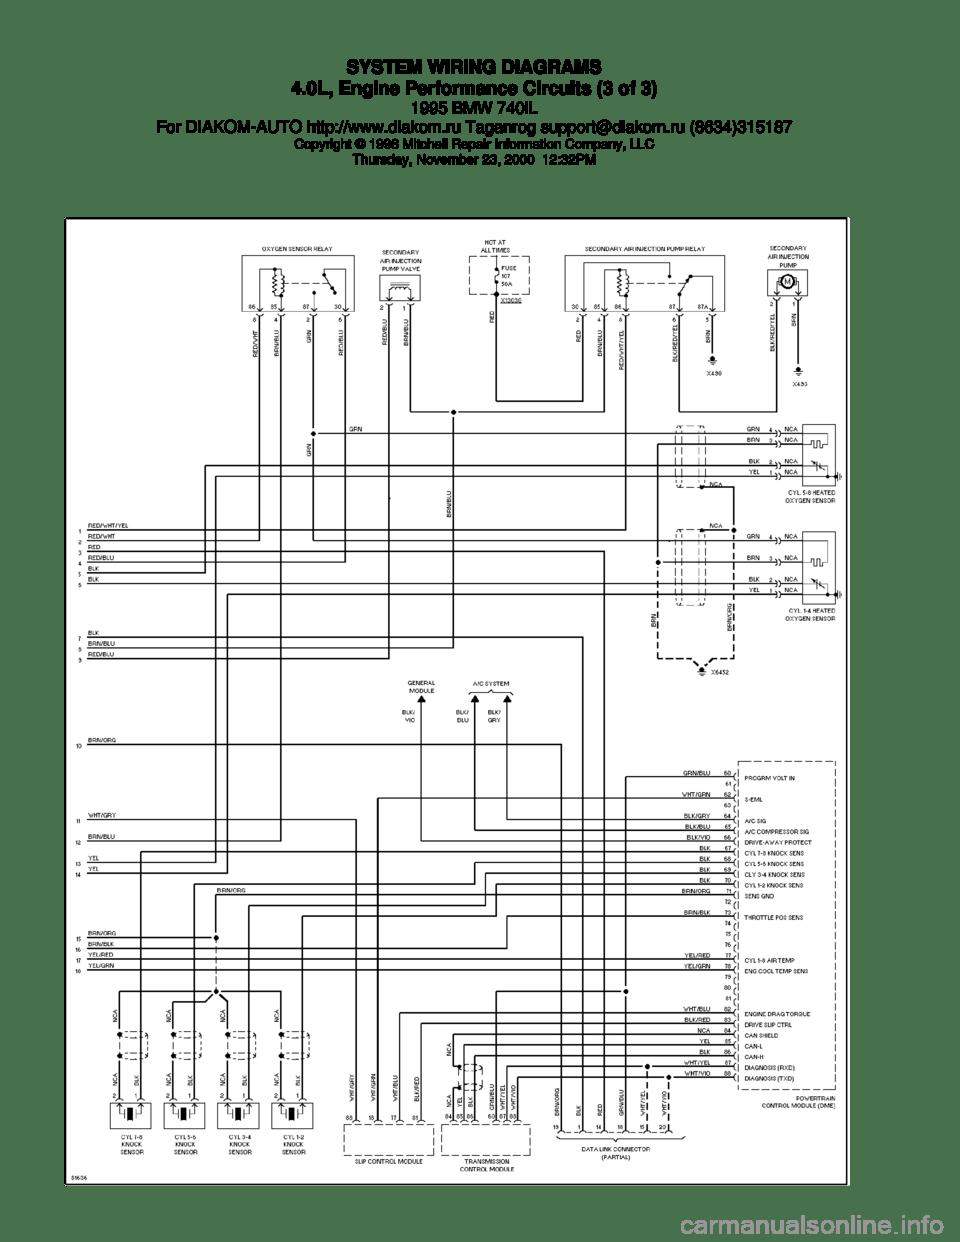 hight resolution of bmw 740il wiring diagram wiring diagram 1998 bmw 740il radio wiring diagram bmw 740il 1995 e38